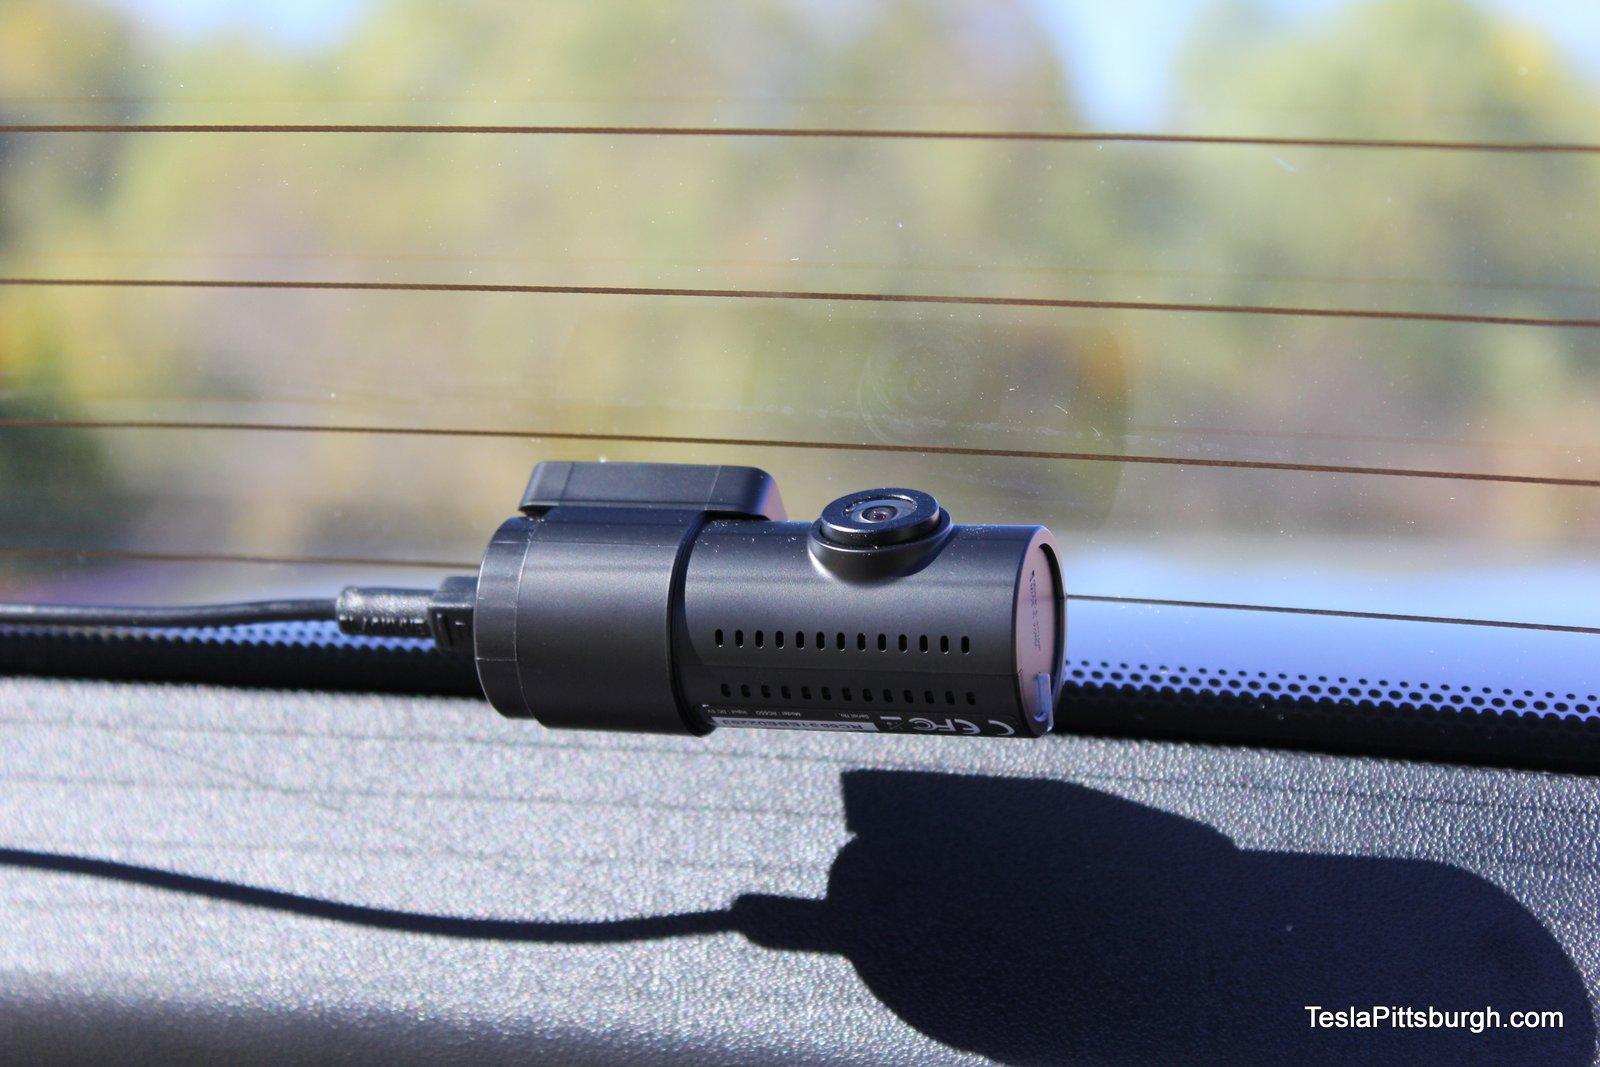 tesla-pittsburgh-dashcam-review-camera-blackvue-camera-rear-mount